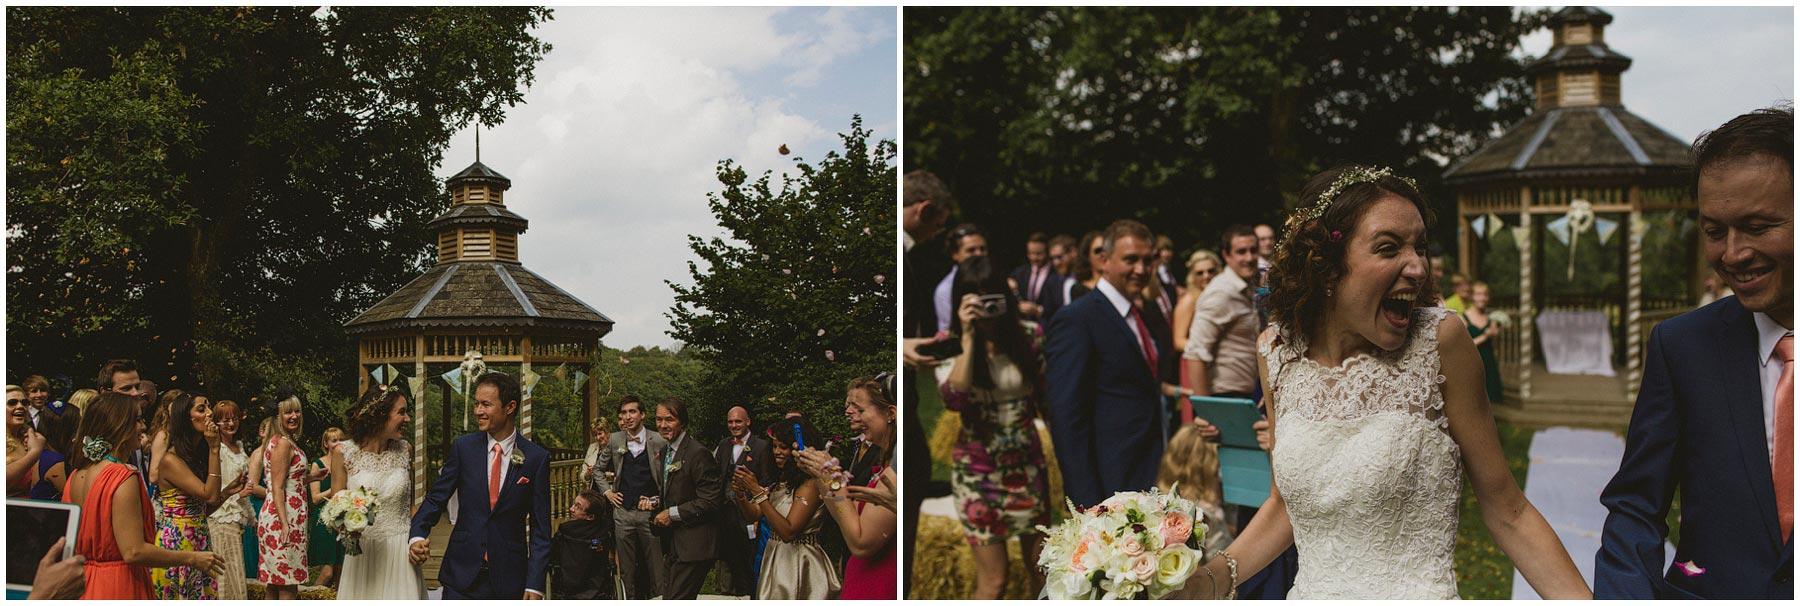 Colehayes-Park-Wedding-Photography_0095